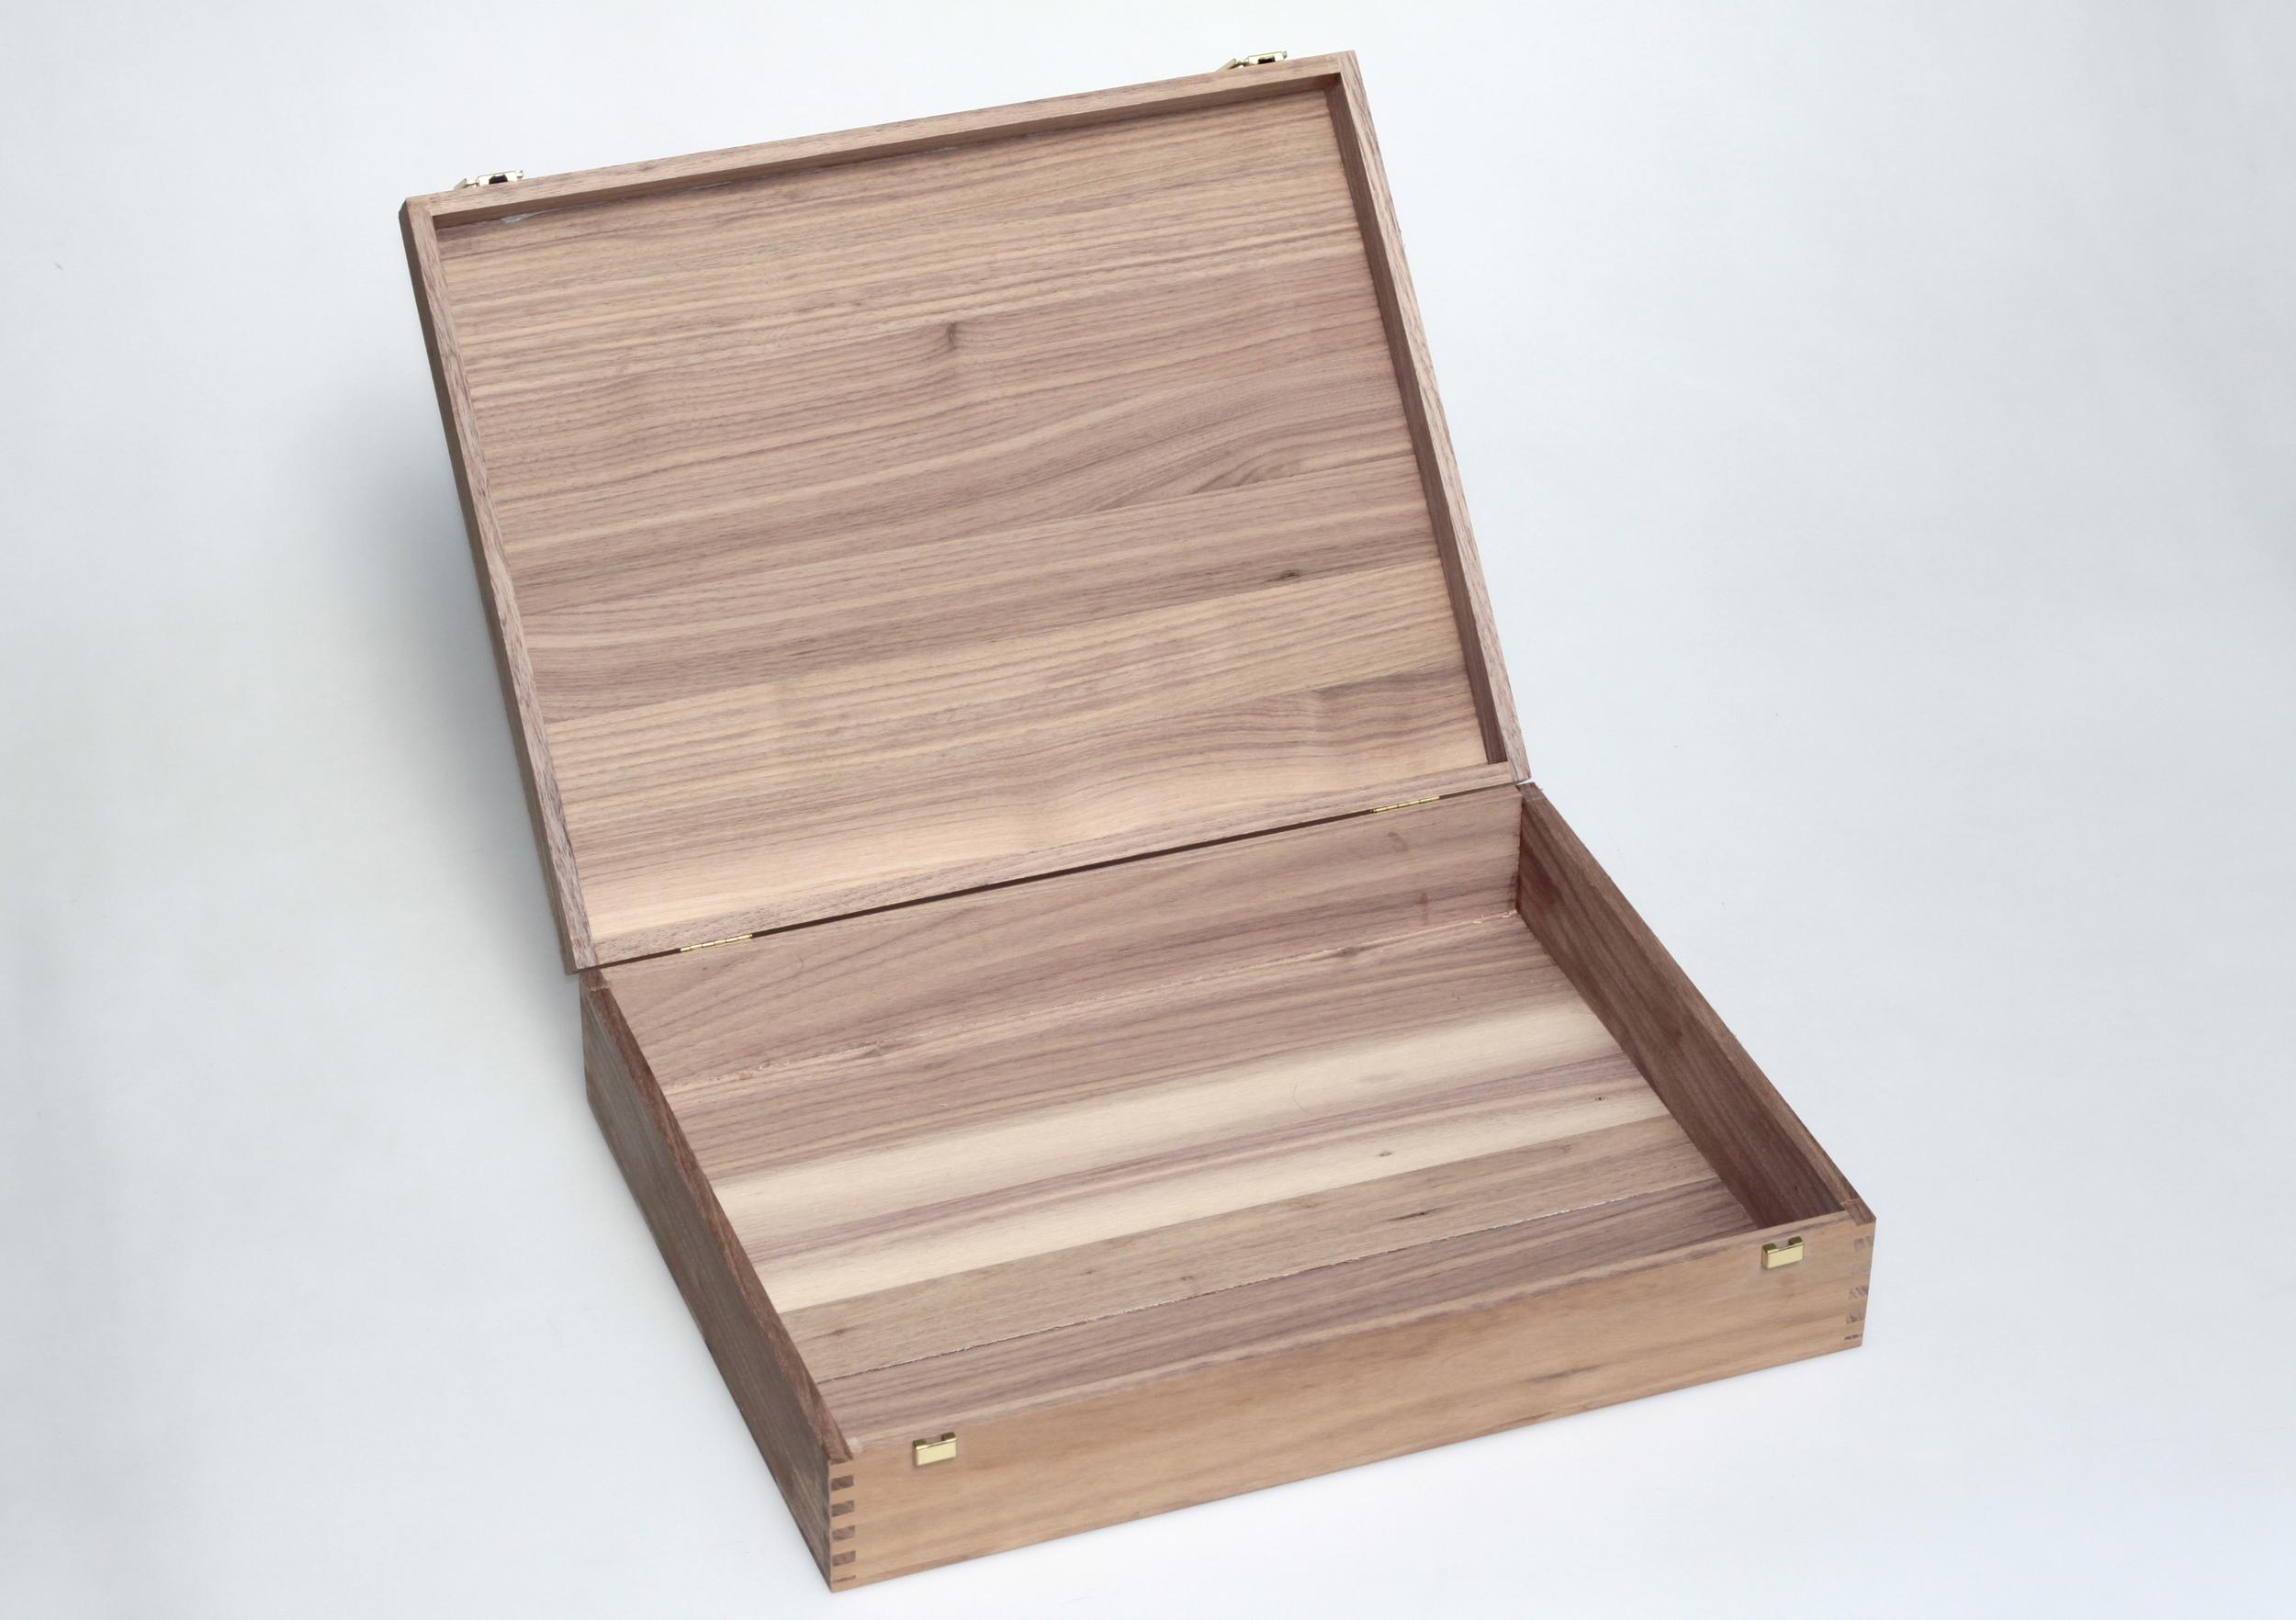 Holzkassette aus Nuss